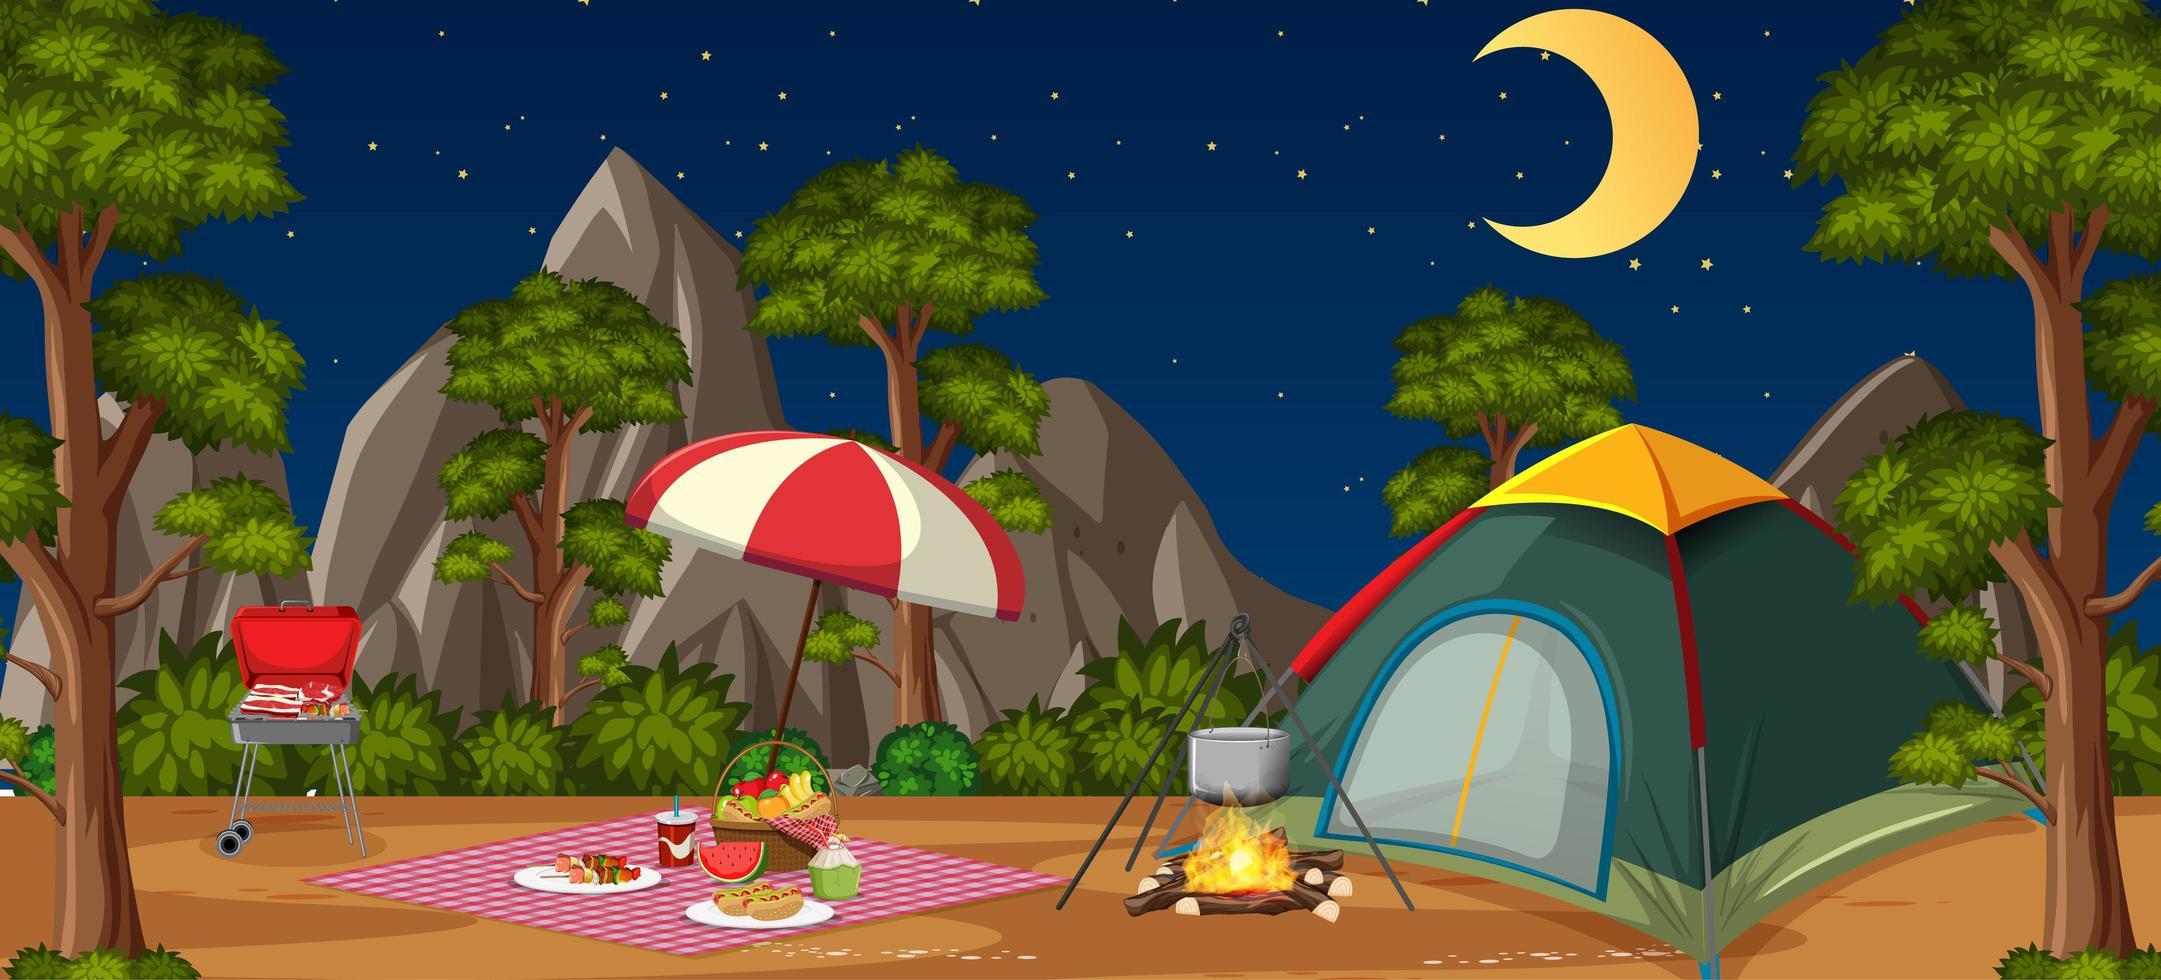 Camping oder Picknick im Naturpark bei Nacht vektor